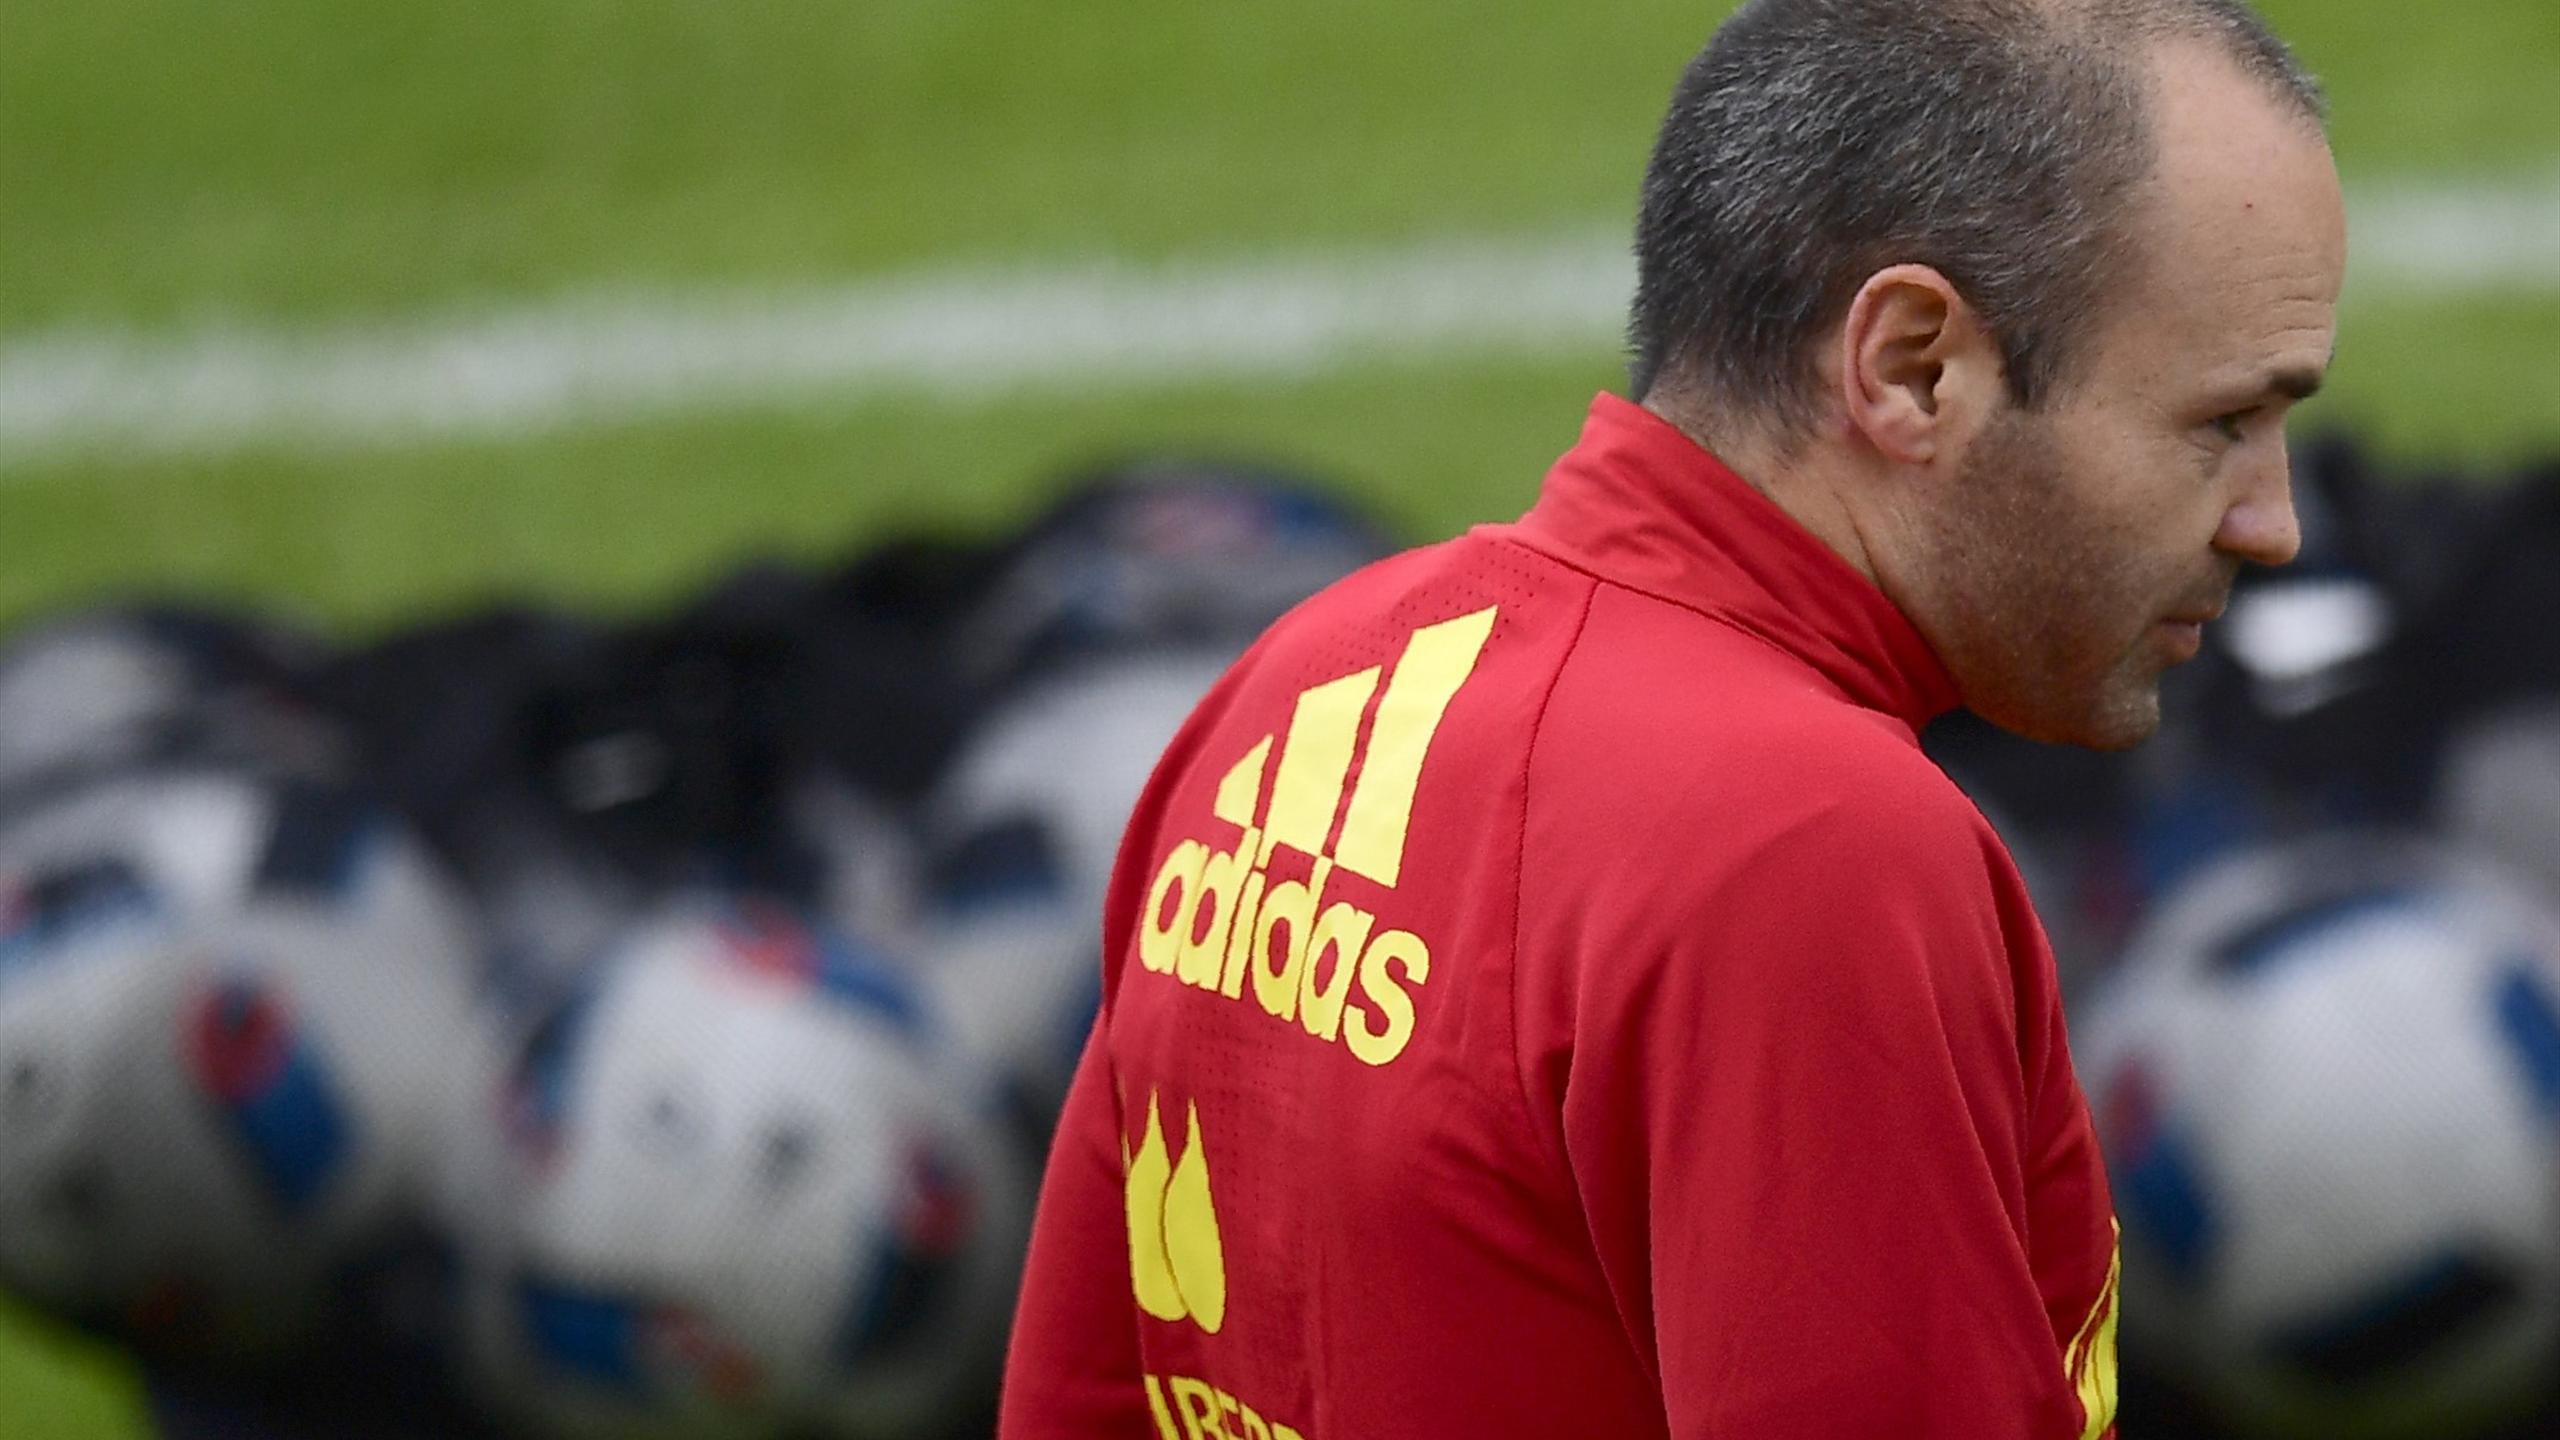 Andres Iniesta in training